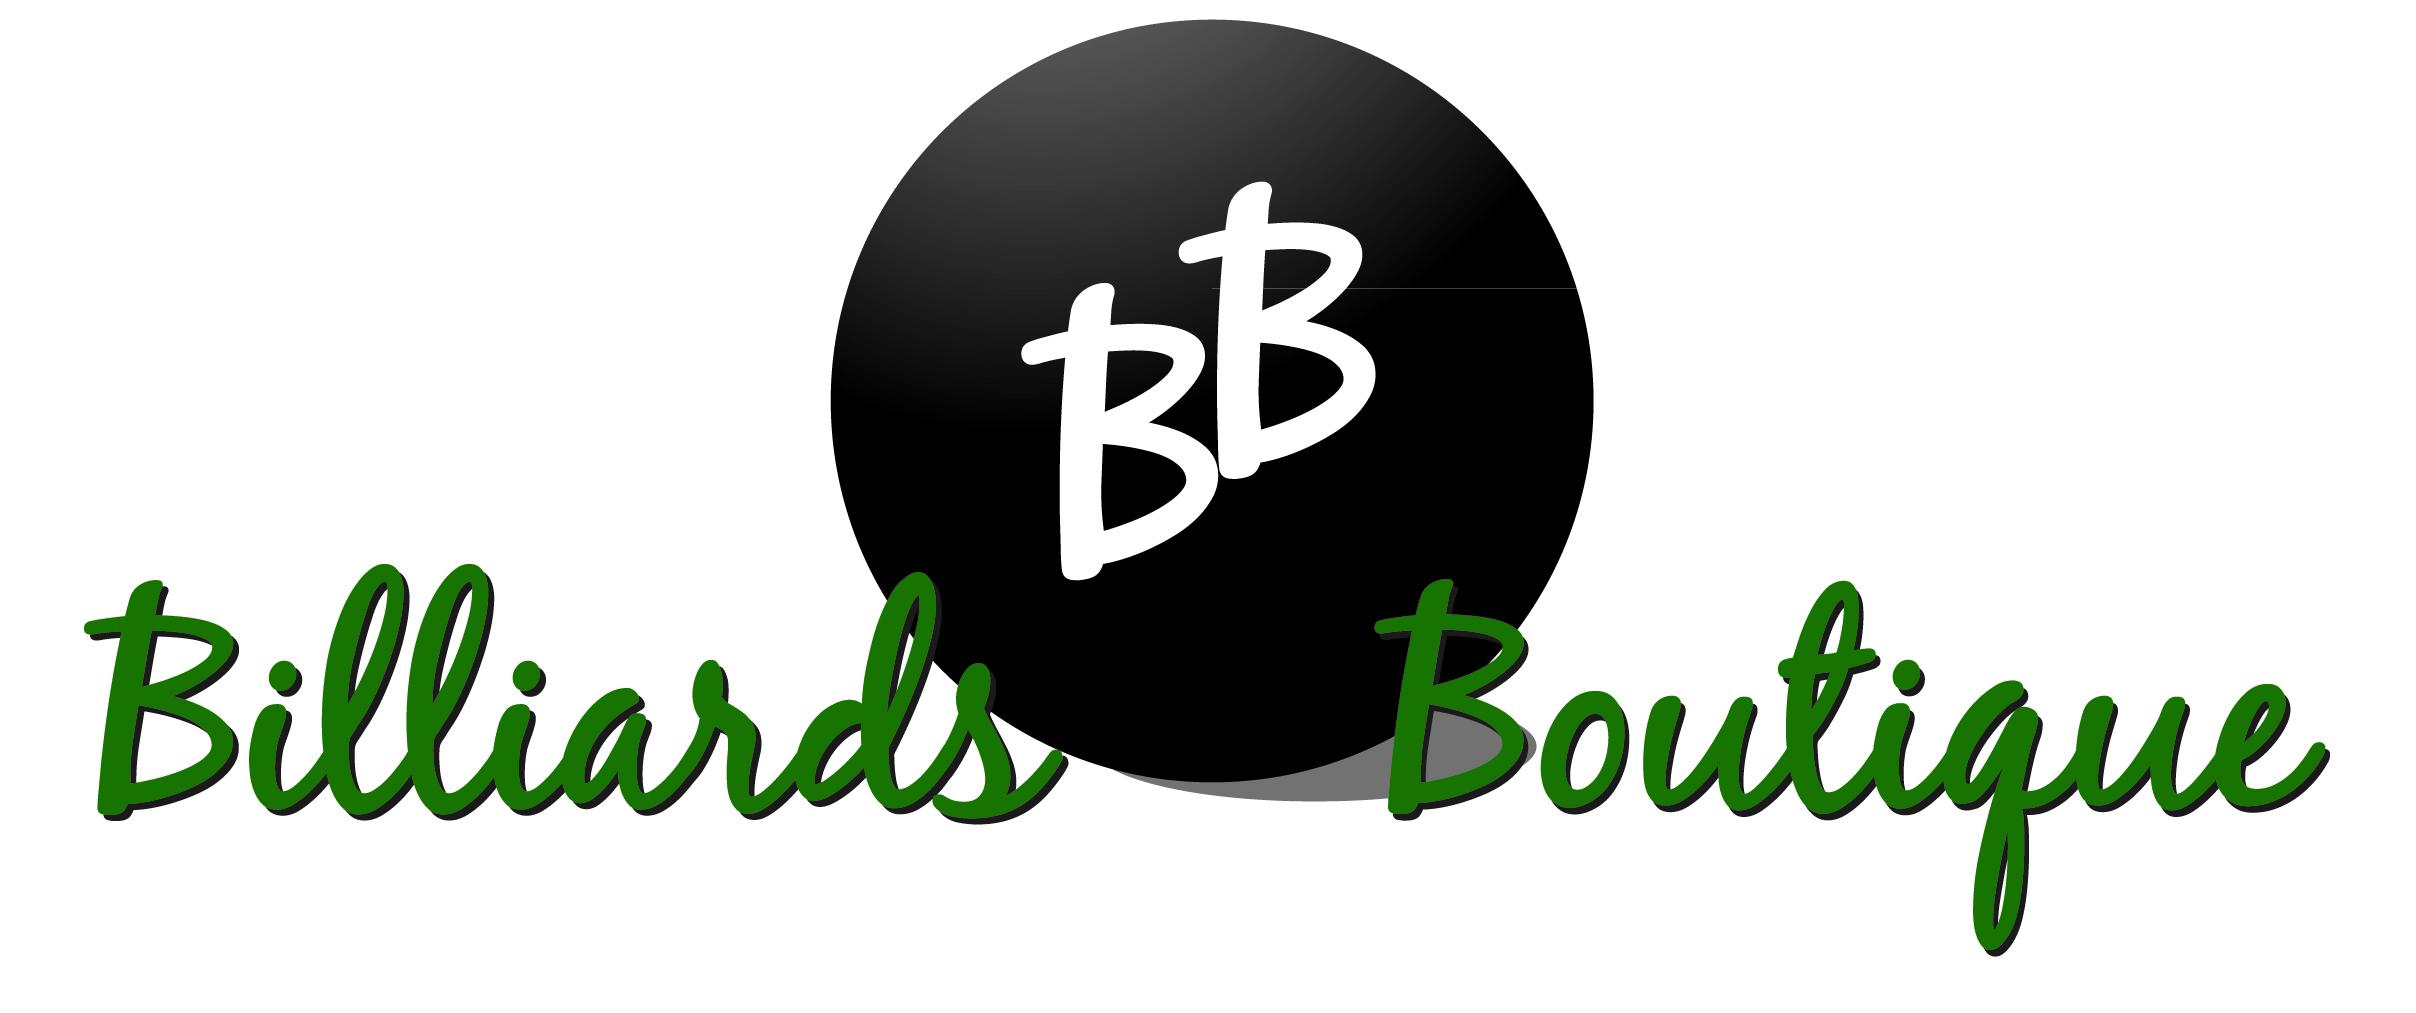 Read billiards boutique Reviews